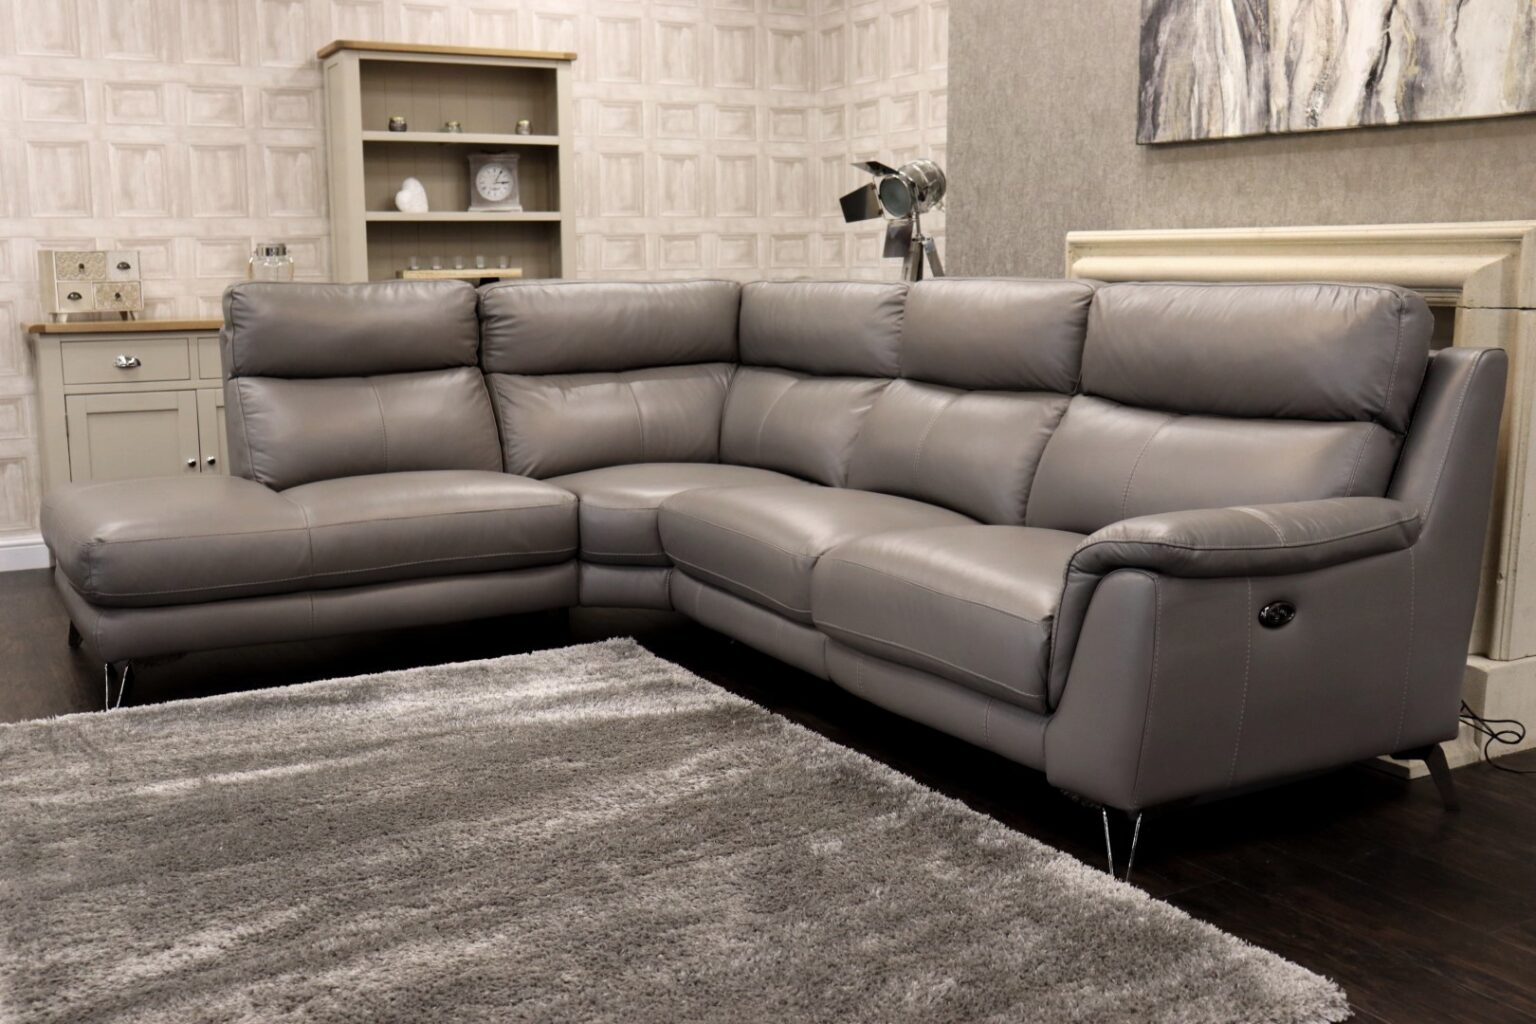 New Incanto Contempo (Famous Designer Brand) Premium Pure With Regard To Contempo Power Reclining Sofas (View 3 of 15)